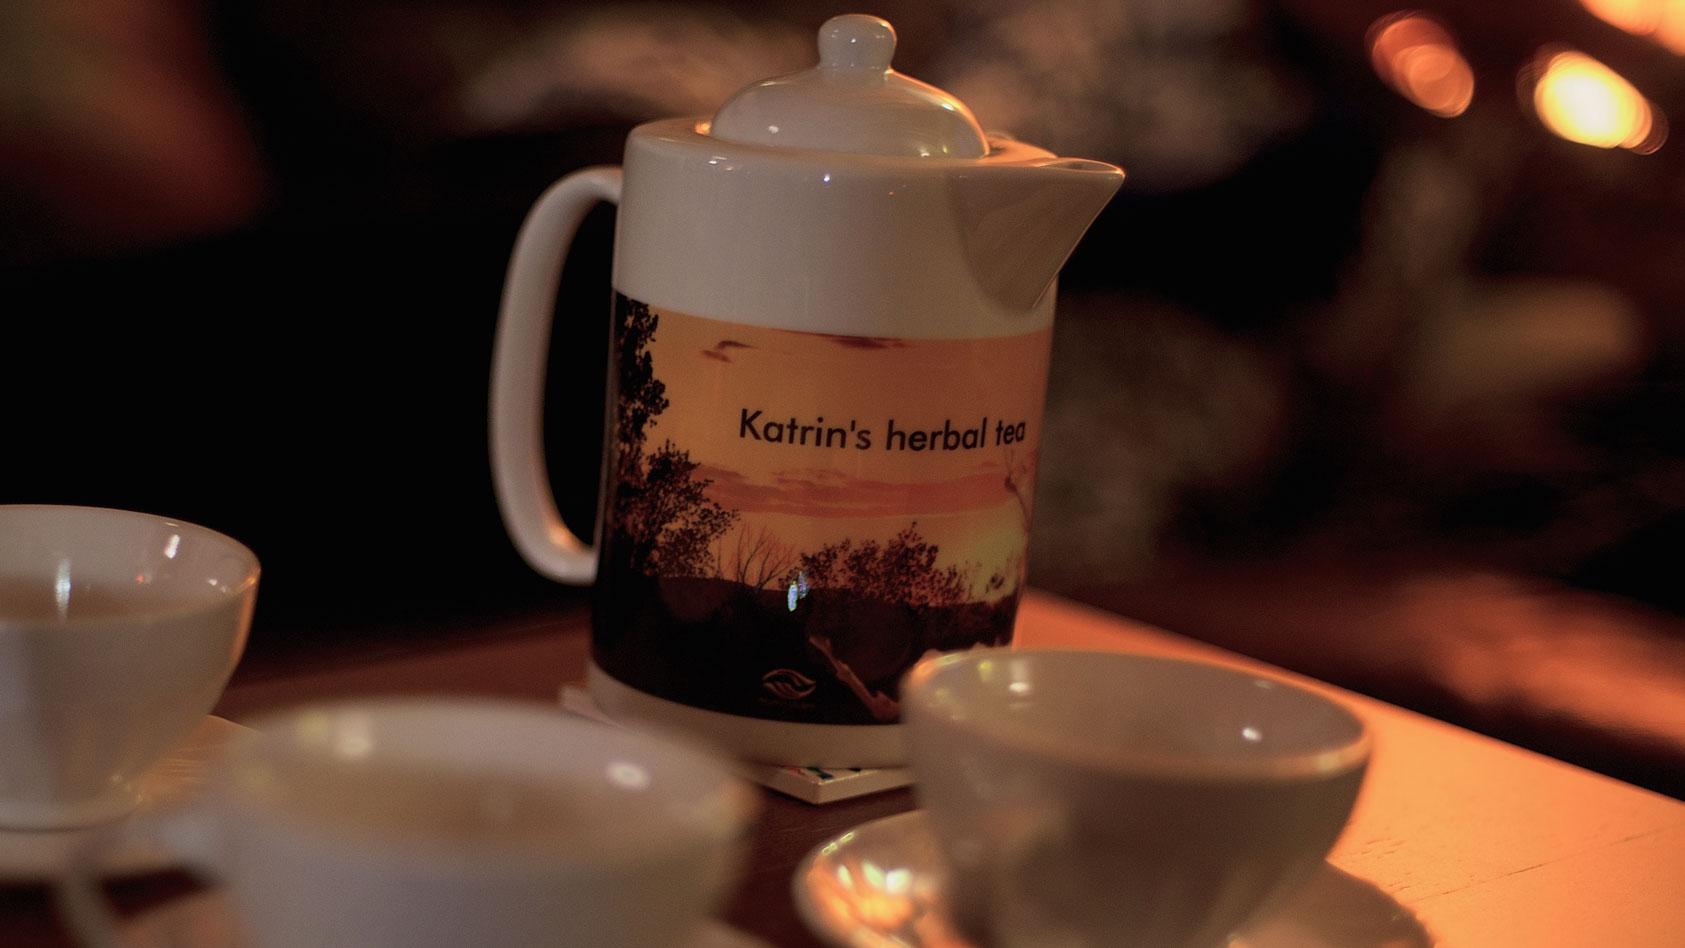 stilleven-katrin's-herbal-tea-kan-saartje-shoot-19-WEB